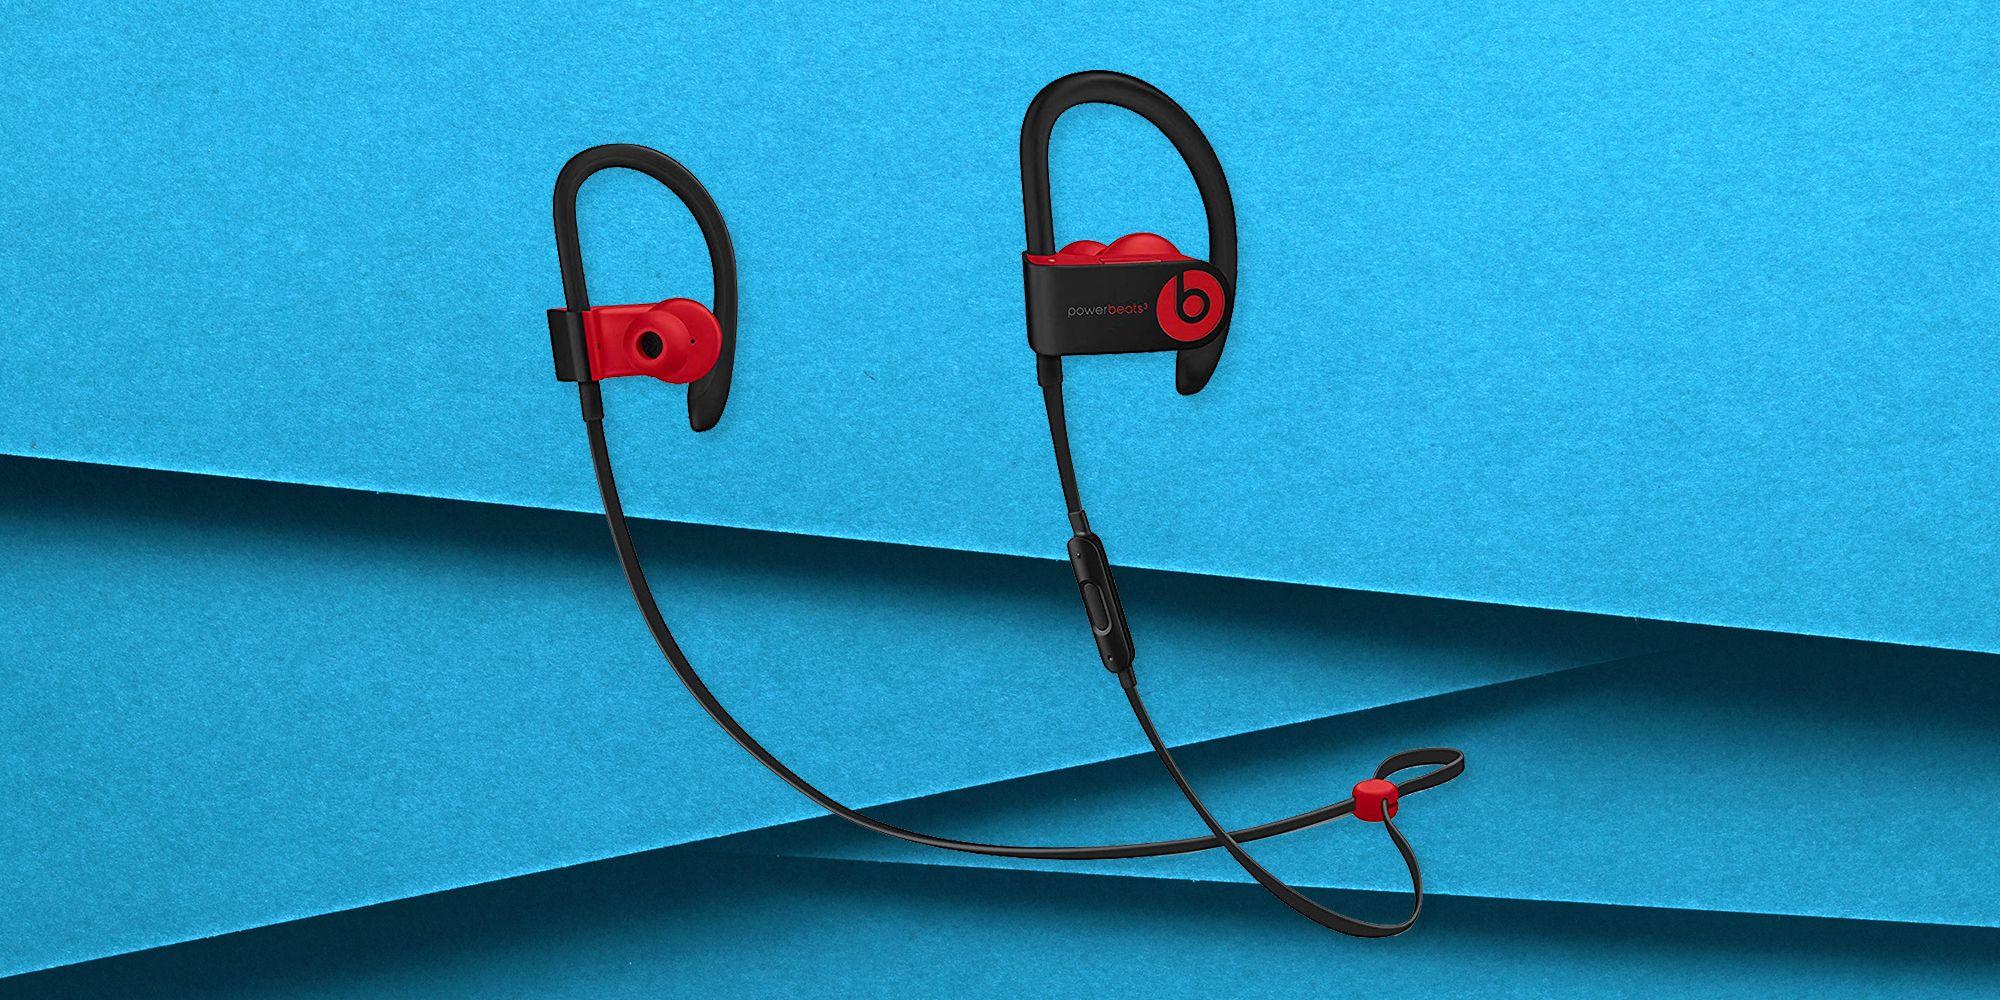 Powerbeats Headphones On Sale For 100 Off Ahead Of Black Friday